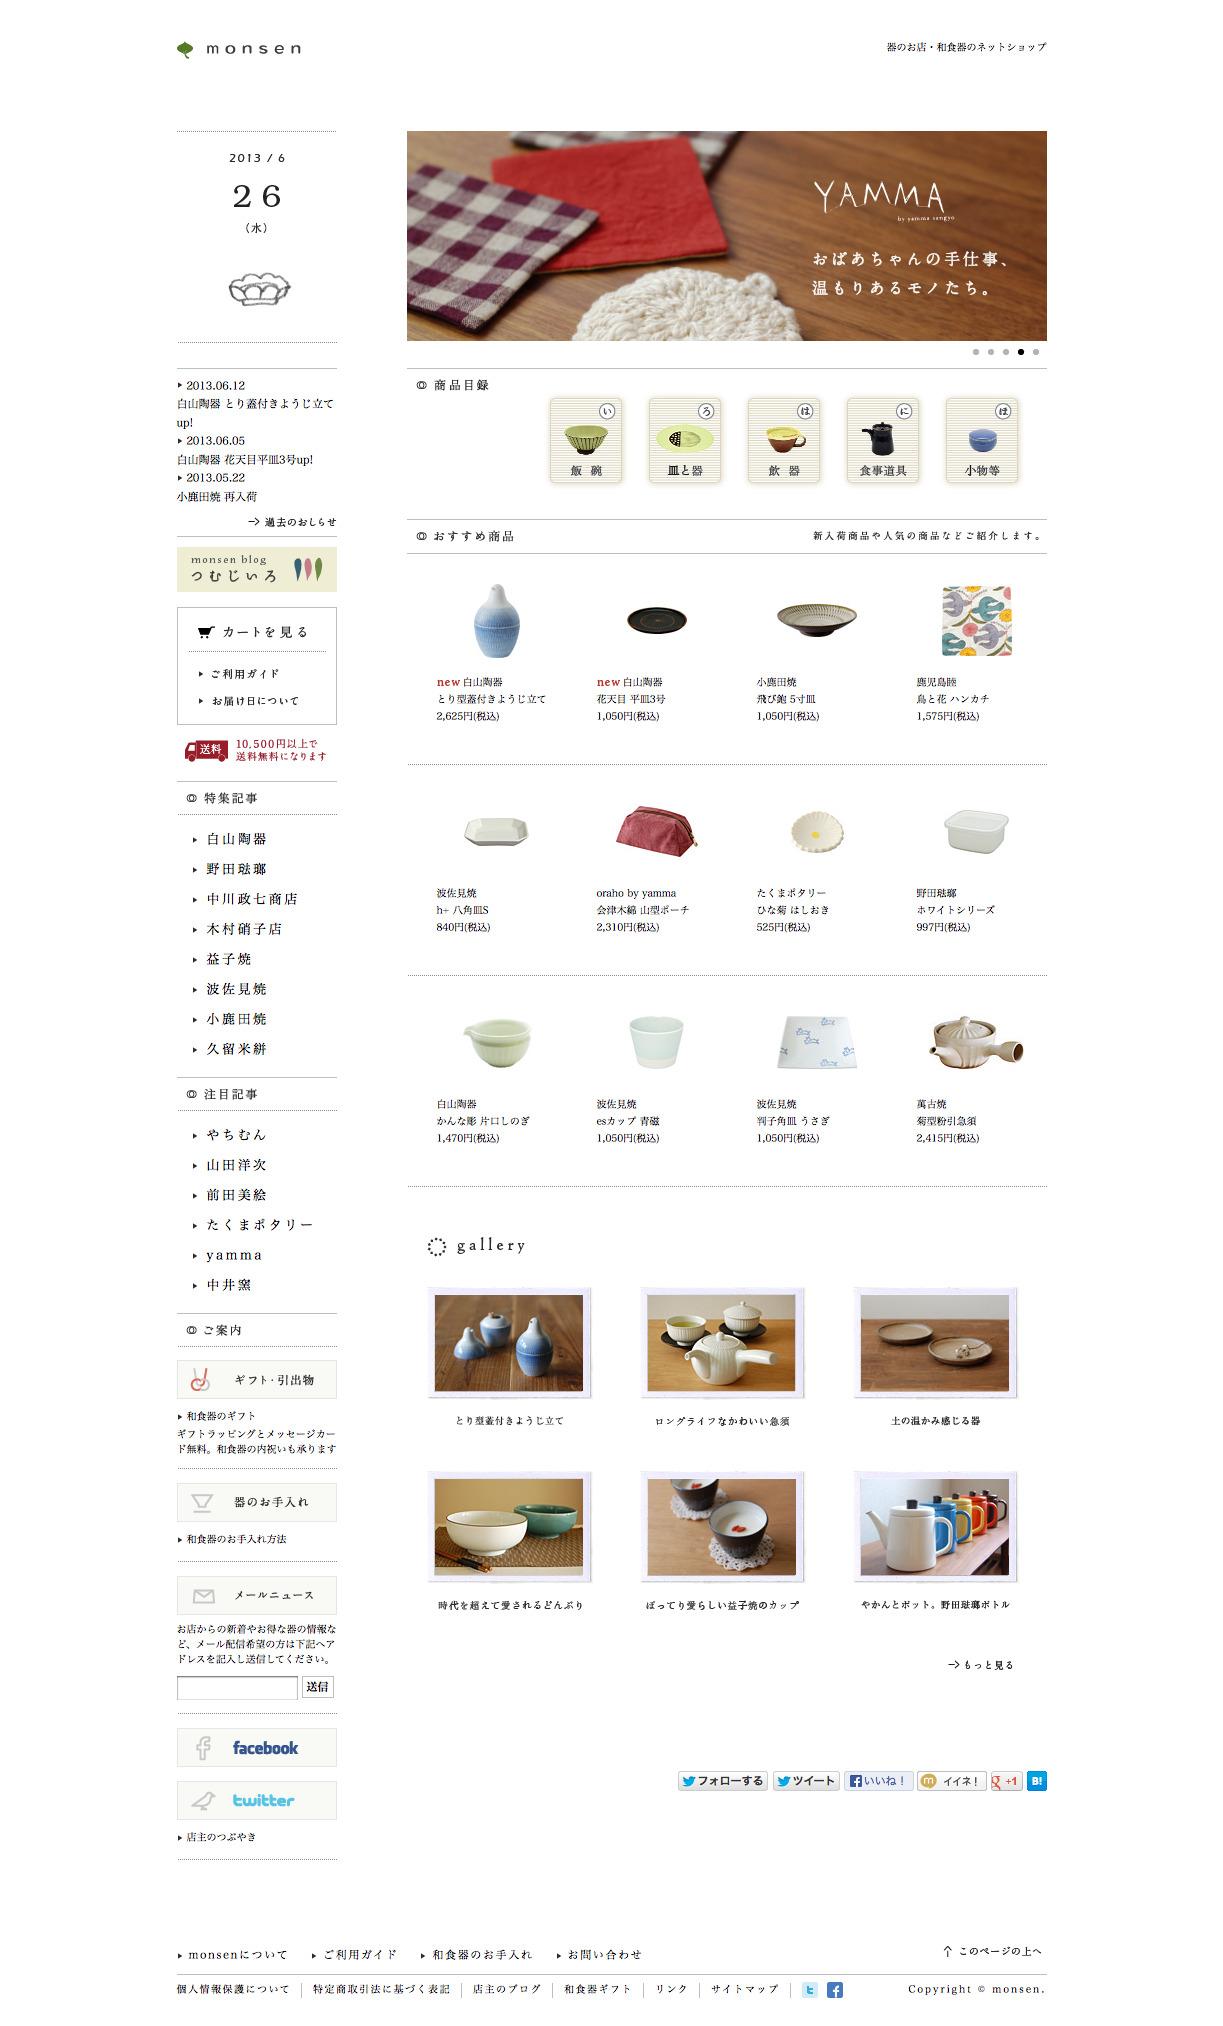 monsen | 器のお店・和食器のネットショップ